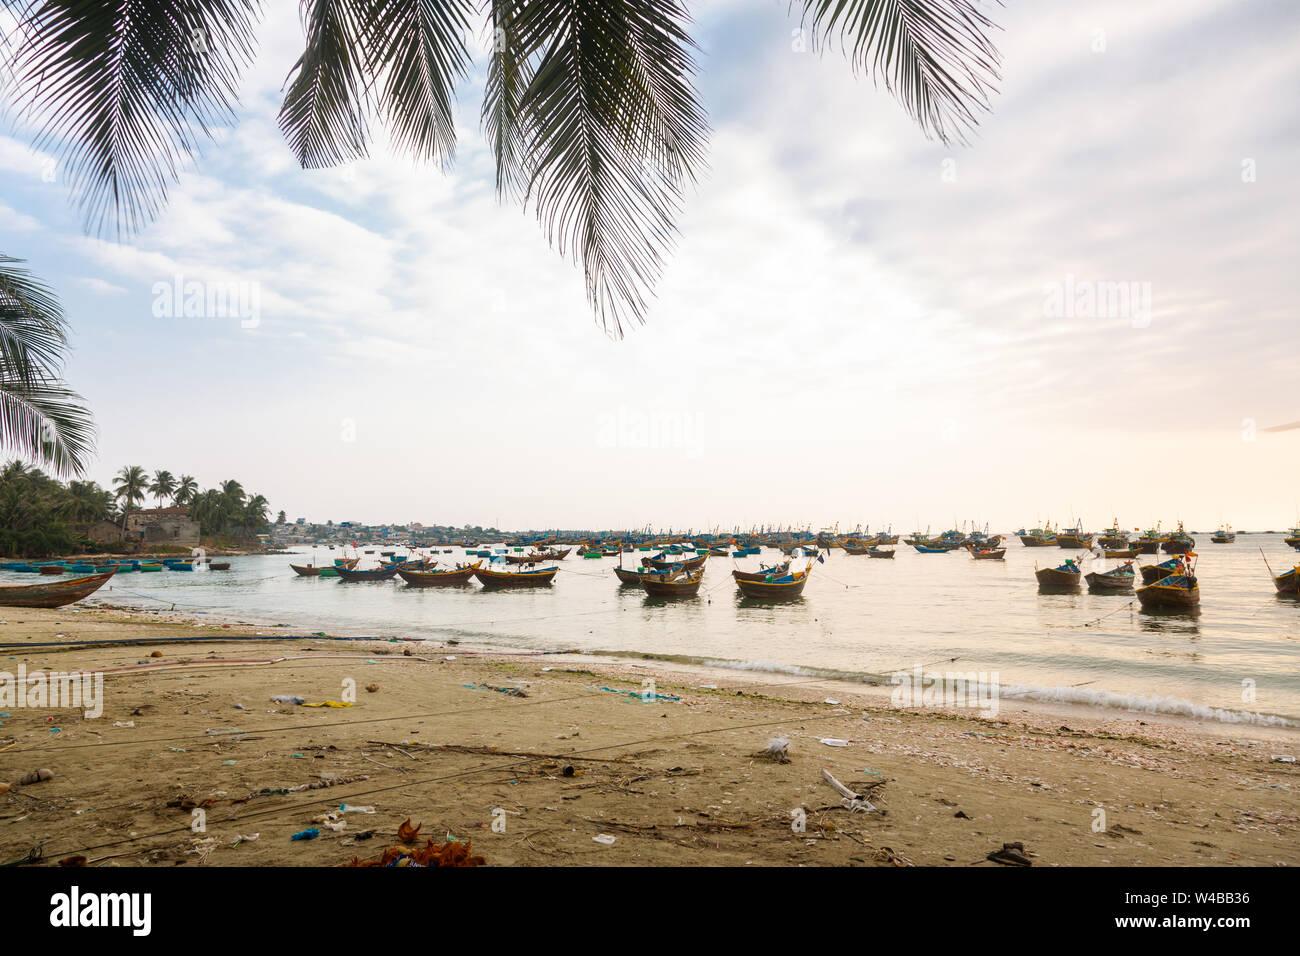 Moored fishing boats at sunset, vietnam Stock Photo